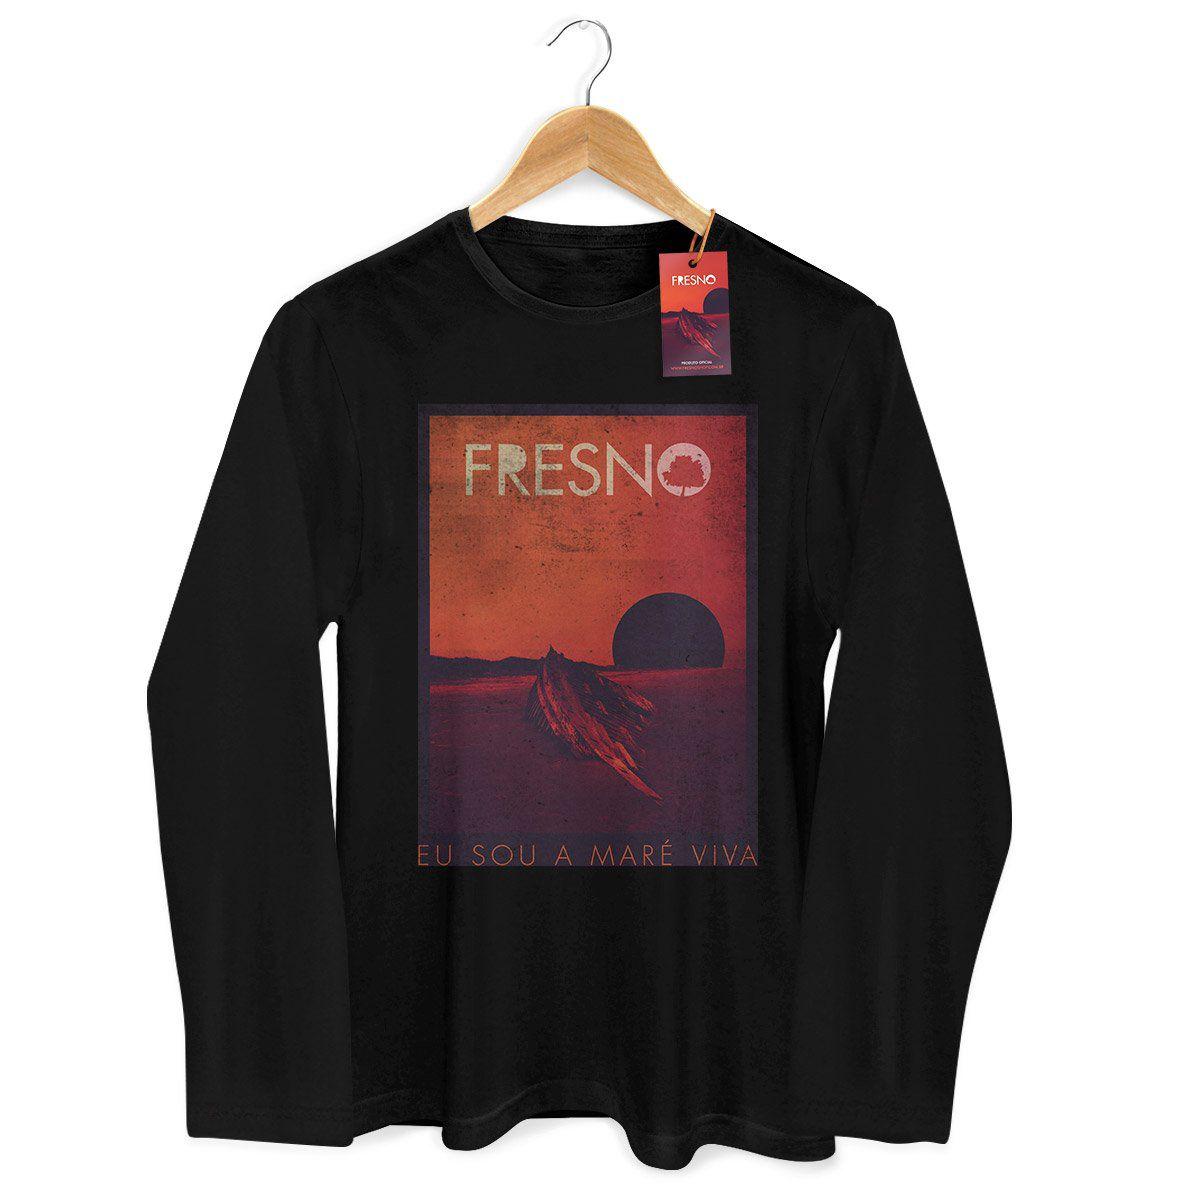 Camiseta Masculina de Manga Longa Fresno Capa Black